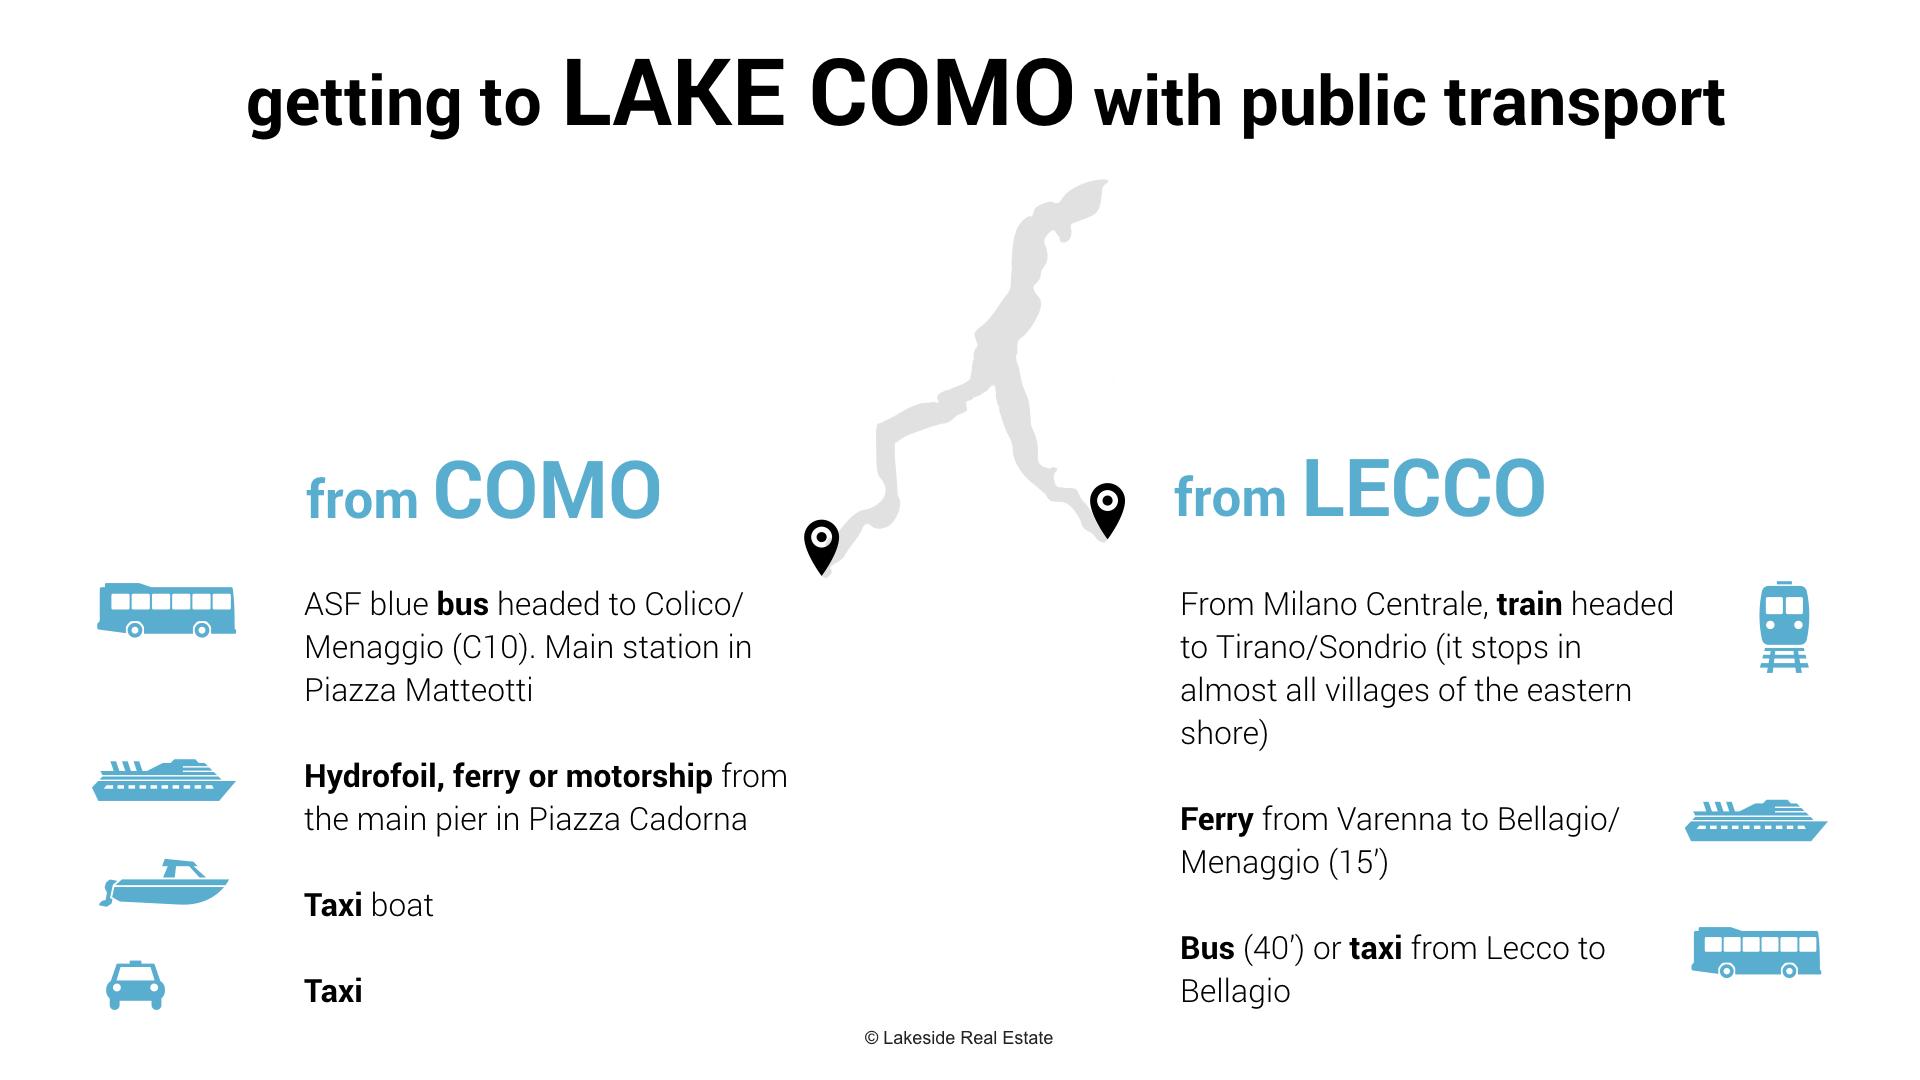 Public transports on Lake Como: a summary